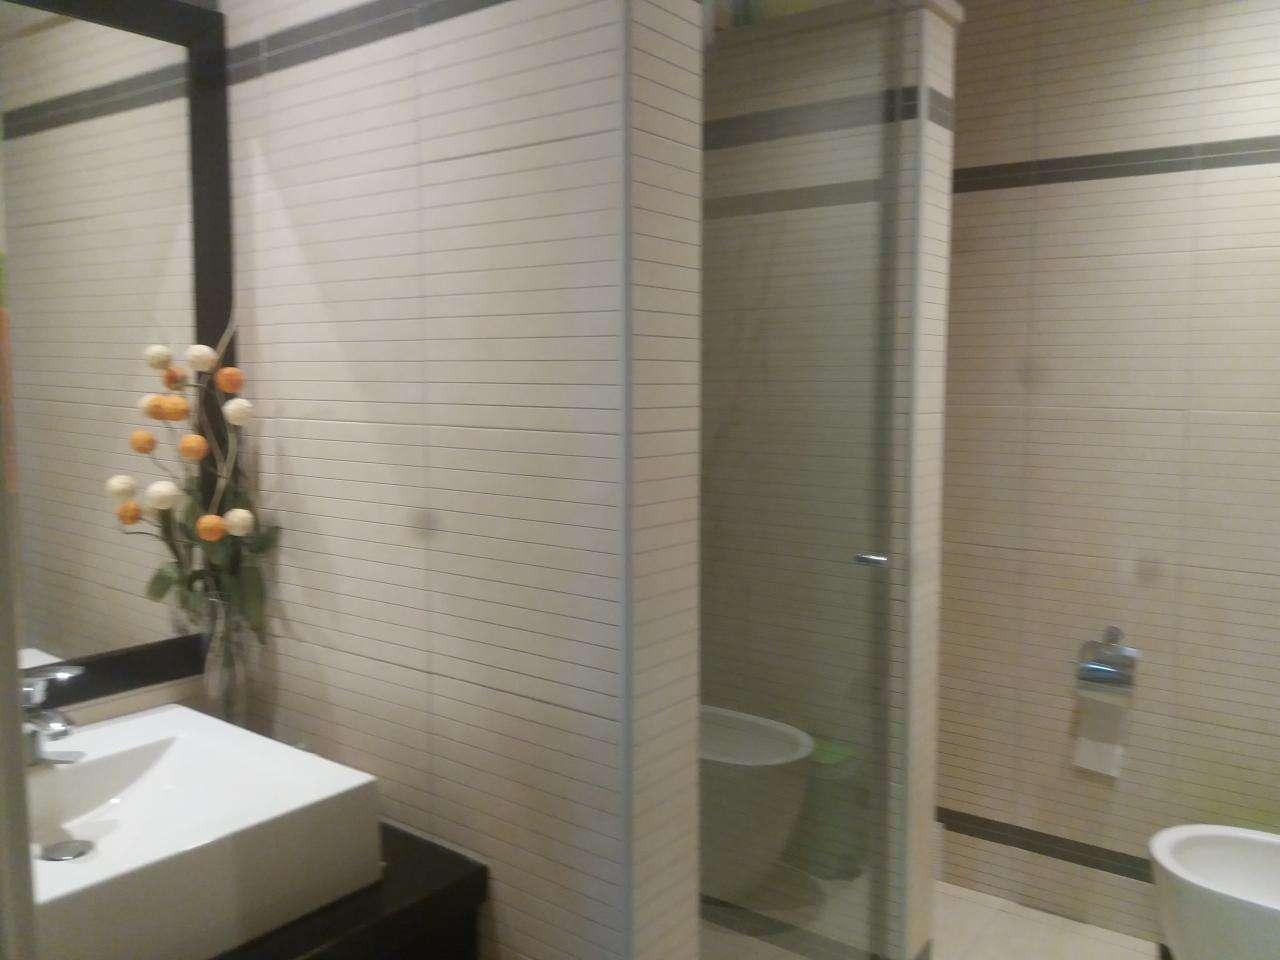 Apartamento para comprar, Mina de Água, Amadora, Lisboa - Foto 37